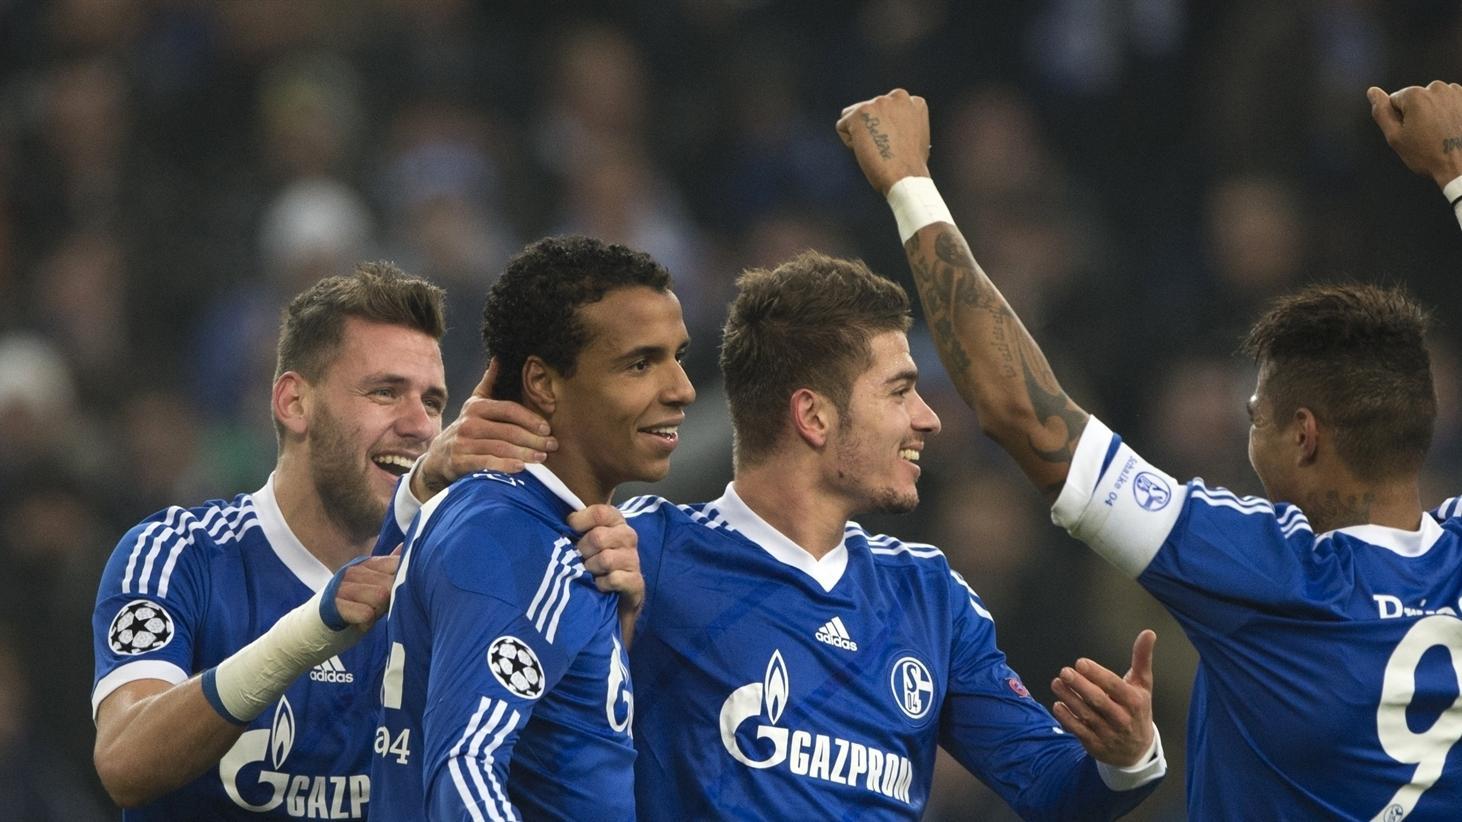 Mengenal Lebih Dekat Klub Schalke 04 4